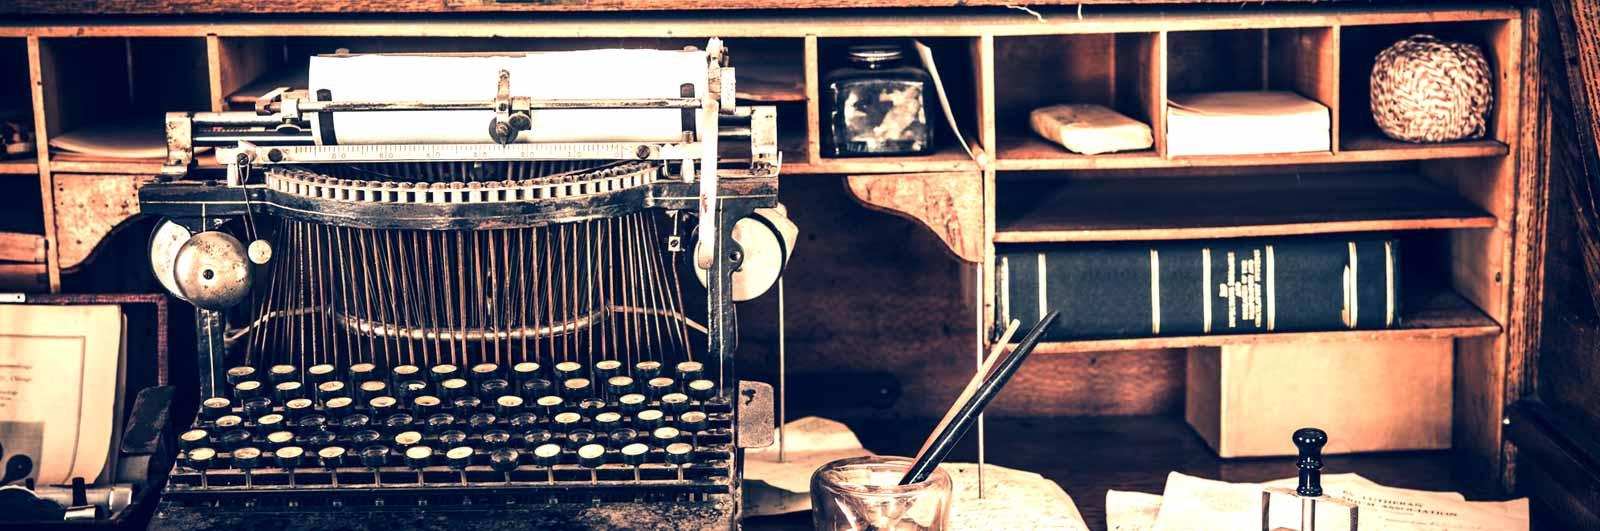 Authorpreneurship